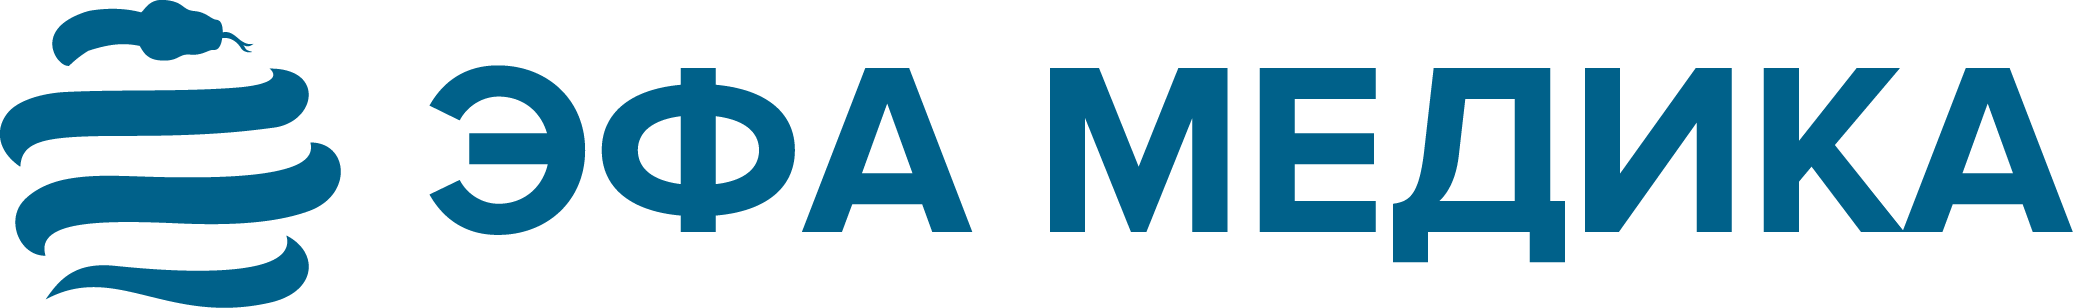 Картинки по запросу ООО «ЭФА медика» логотип